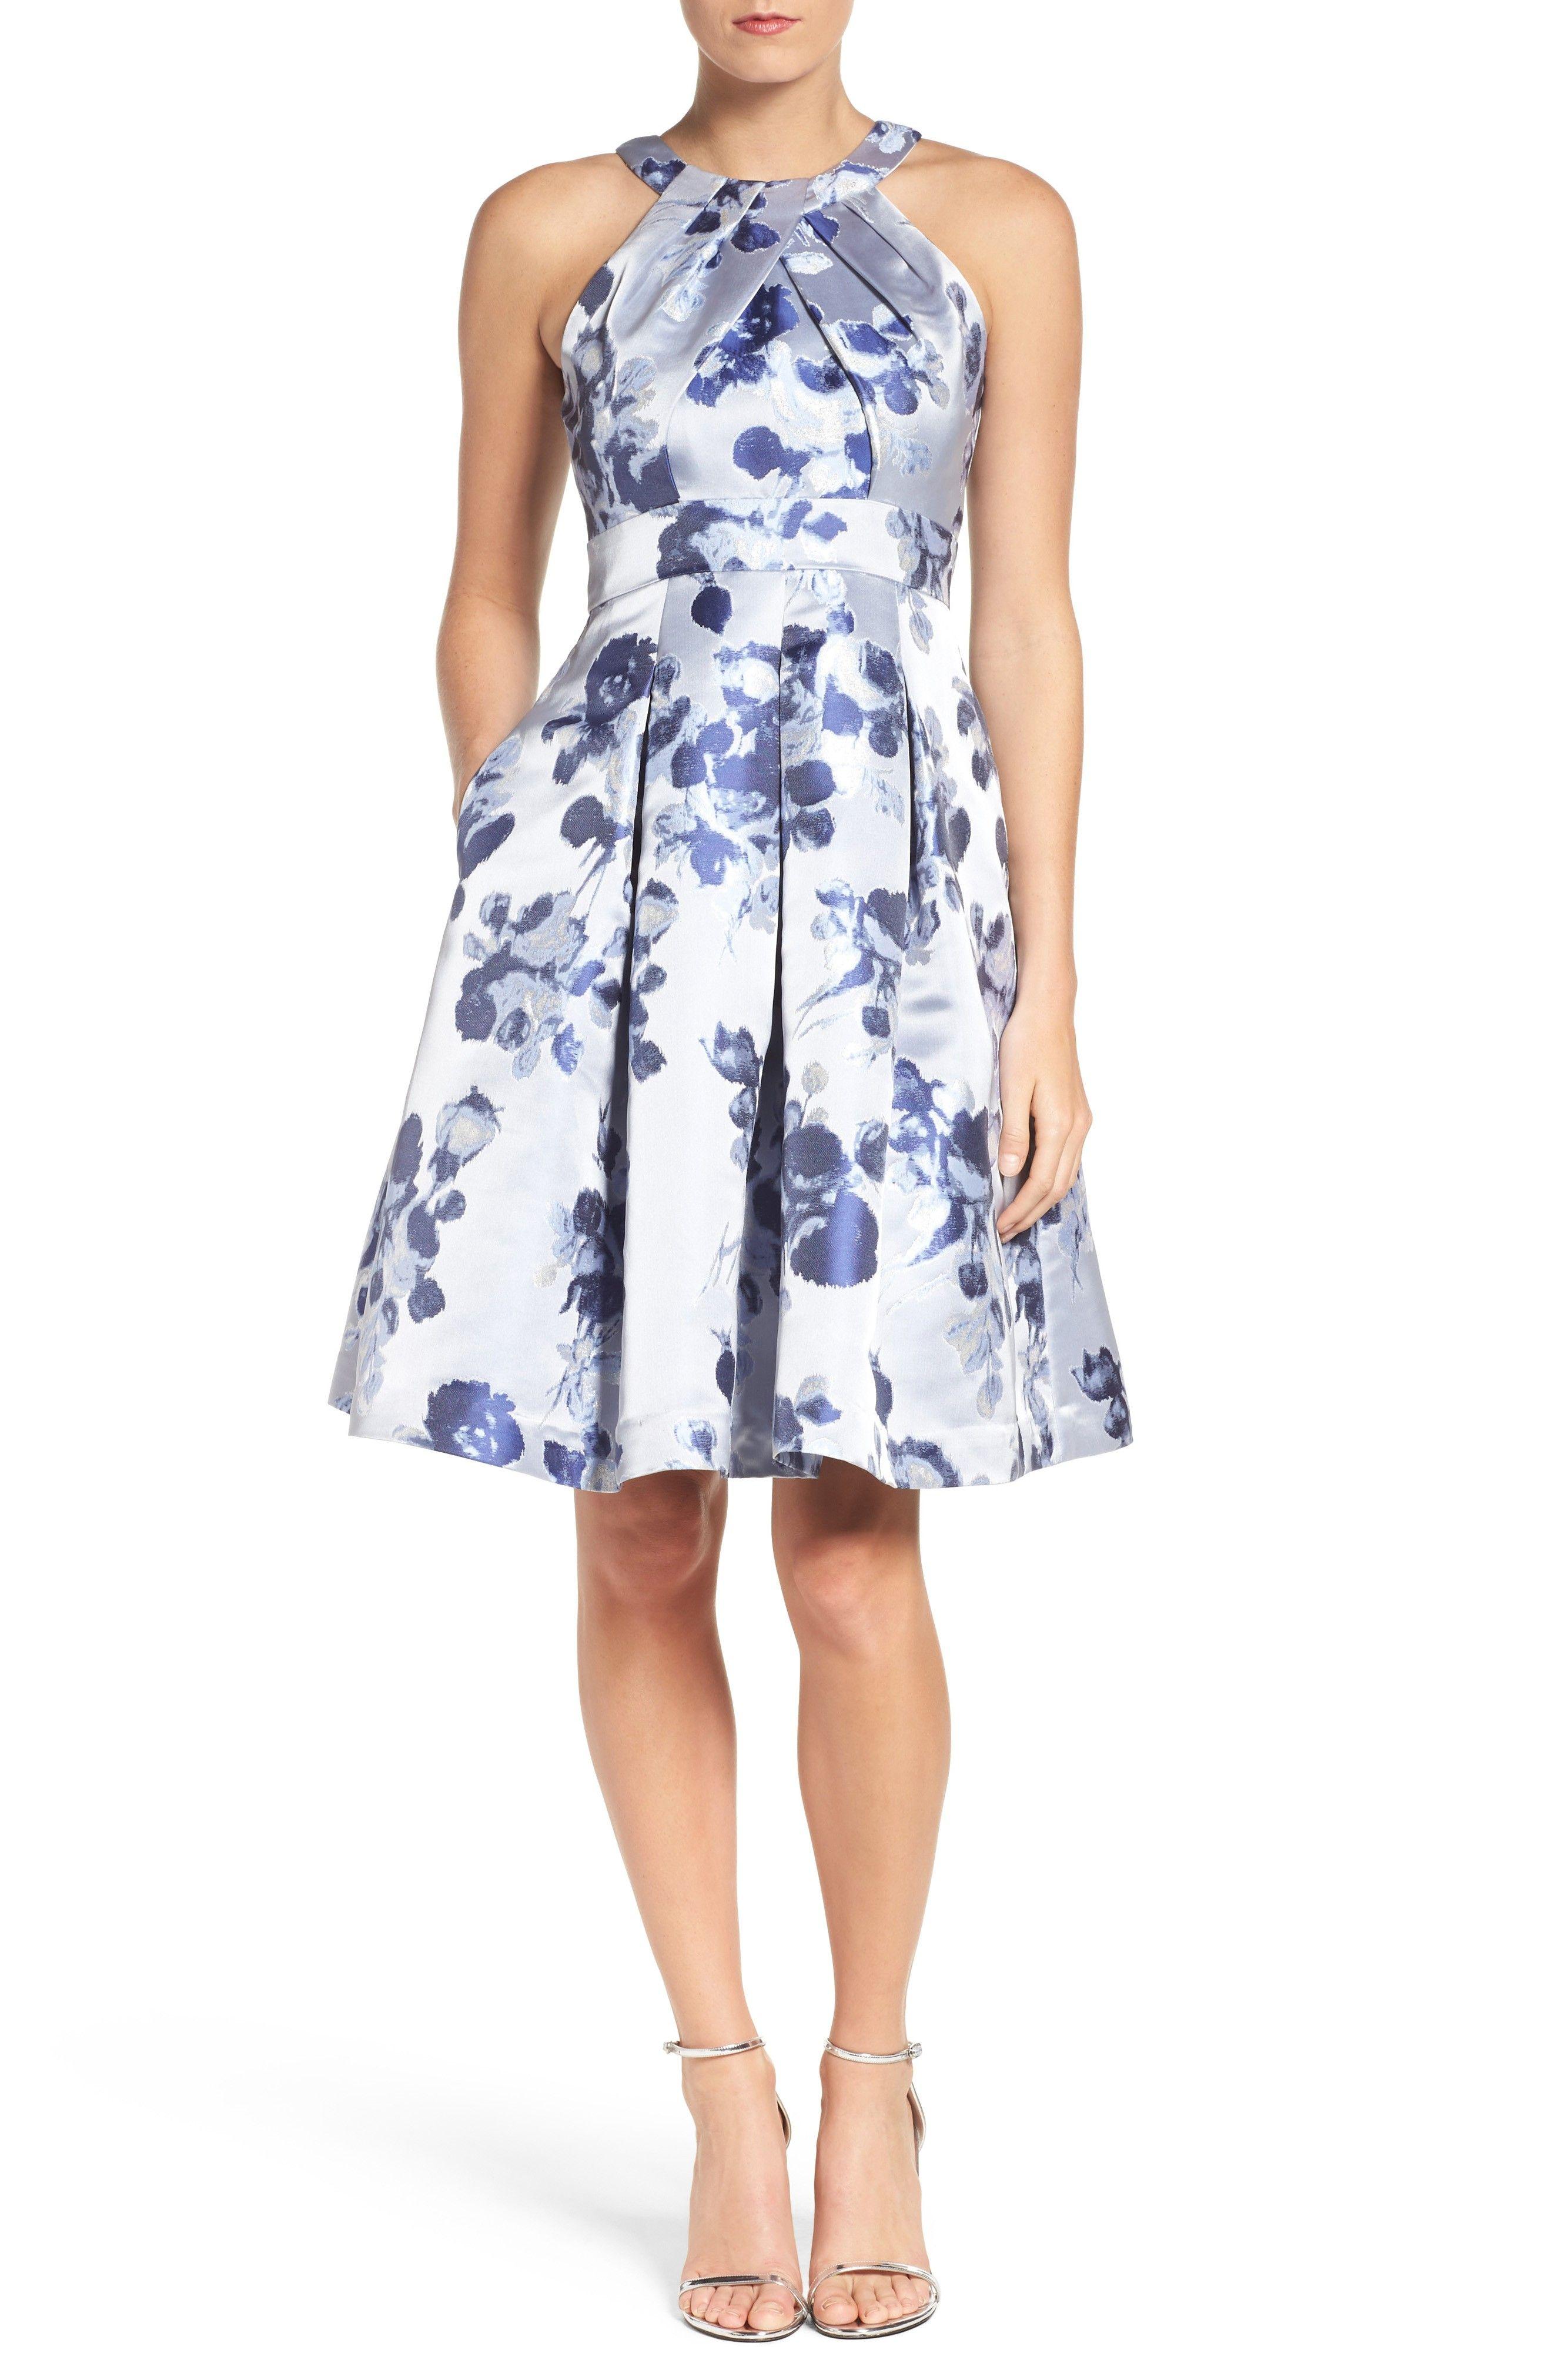 New eliza j floral fit flare dress fashion online shop